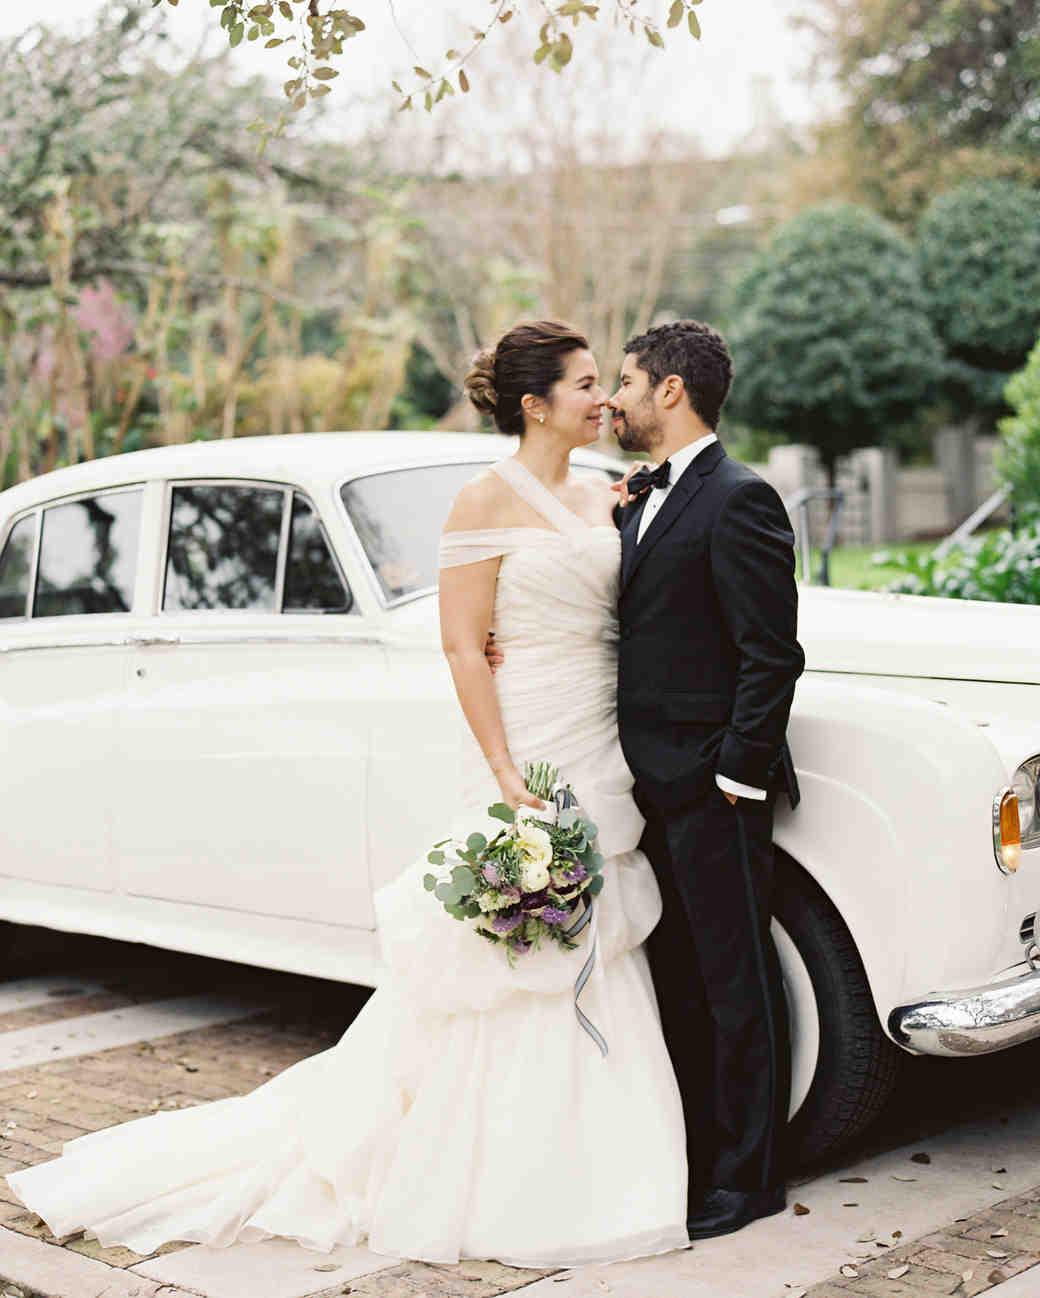 stacey-adam-wedding-couple-0039-s112112-0815.jpg